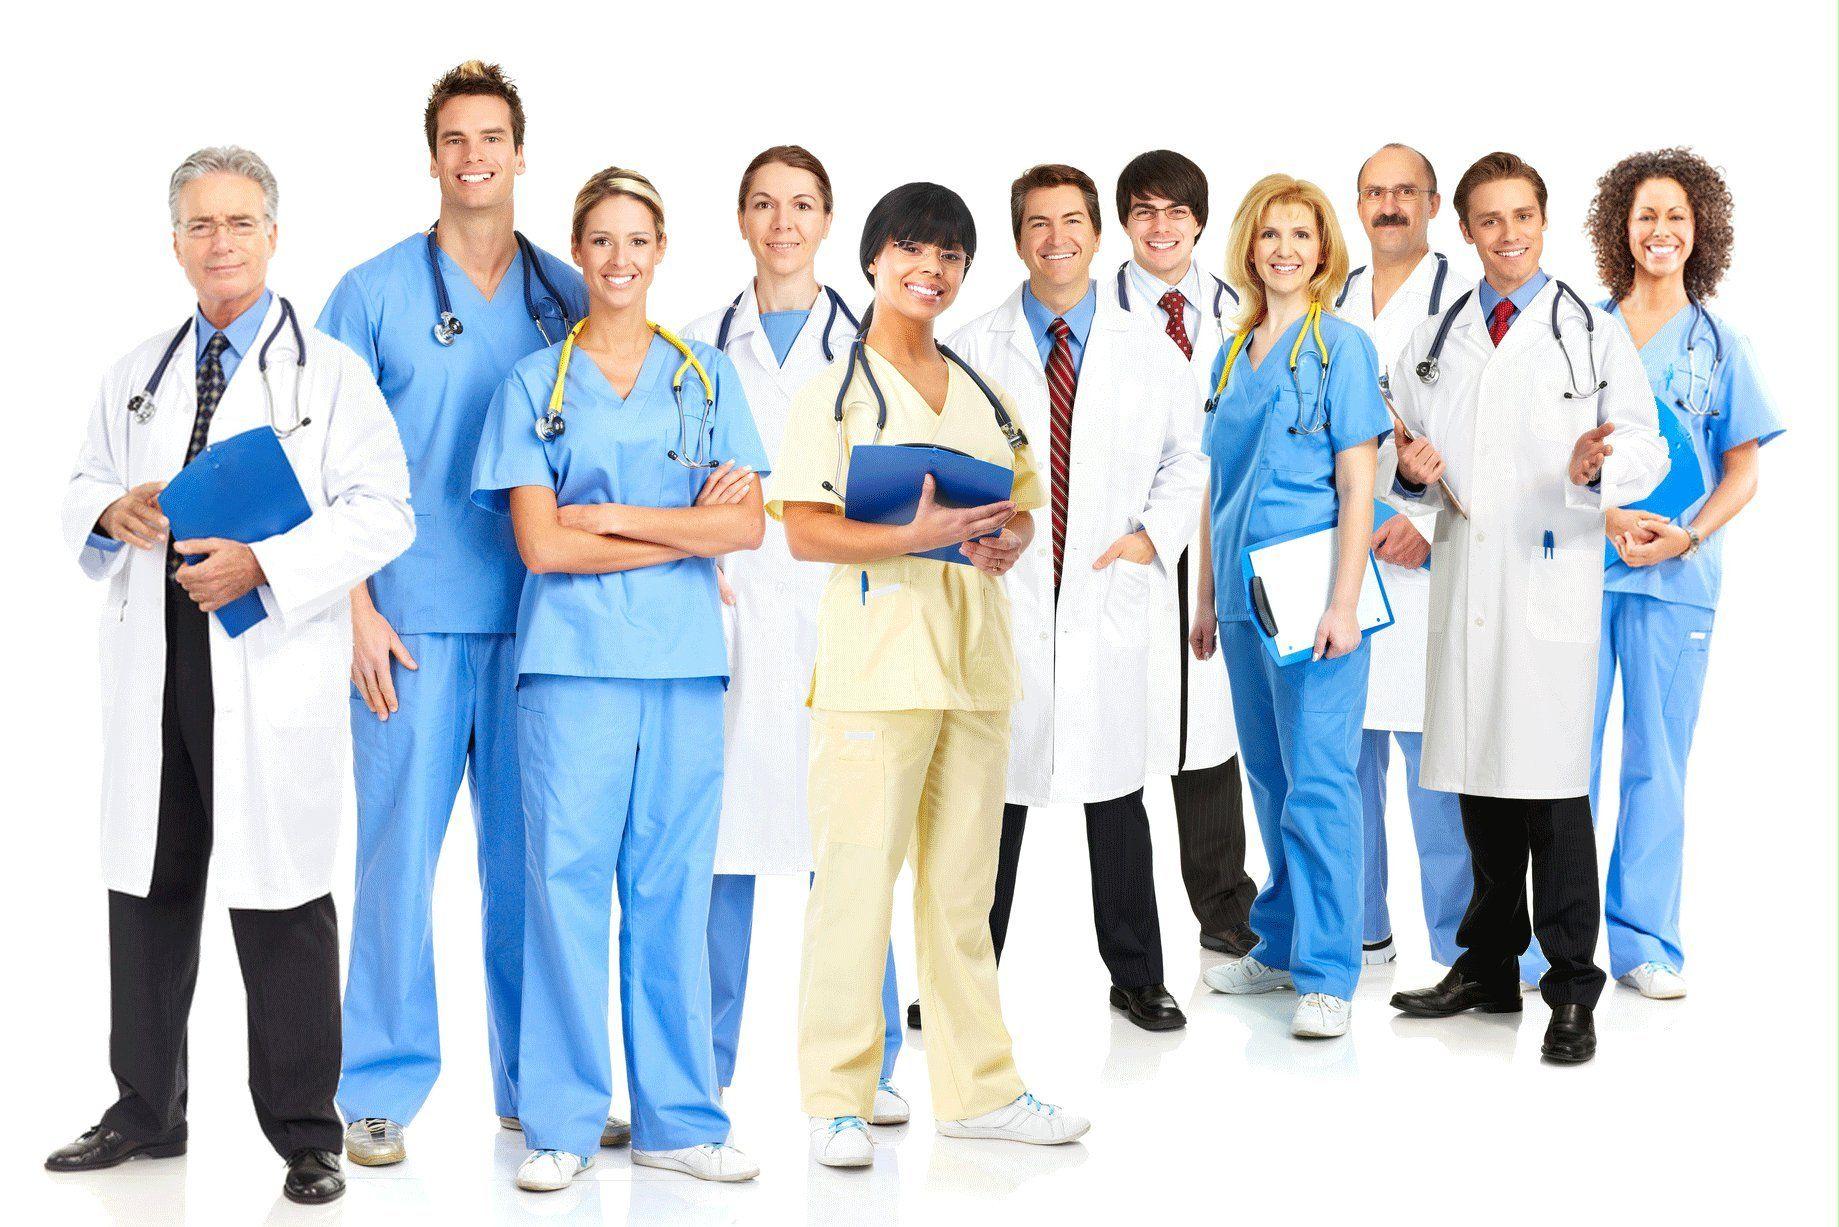 healthcare-professionals-medical